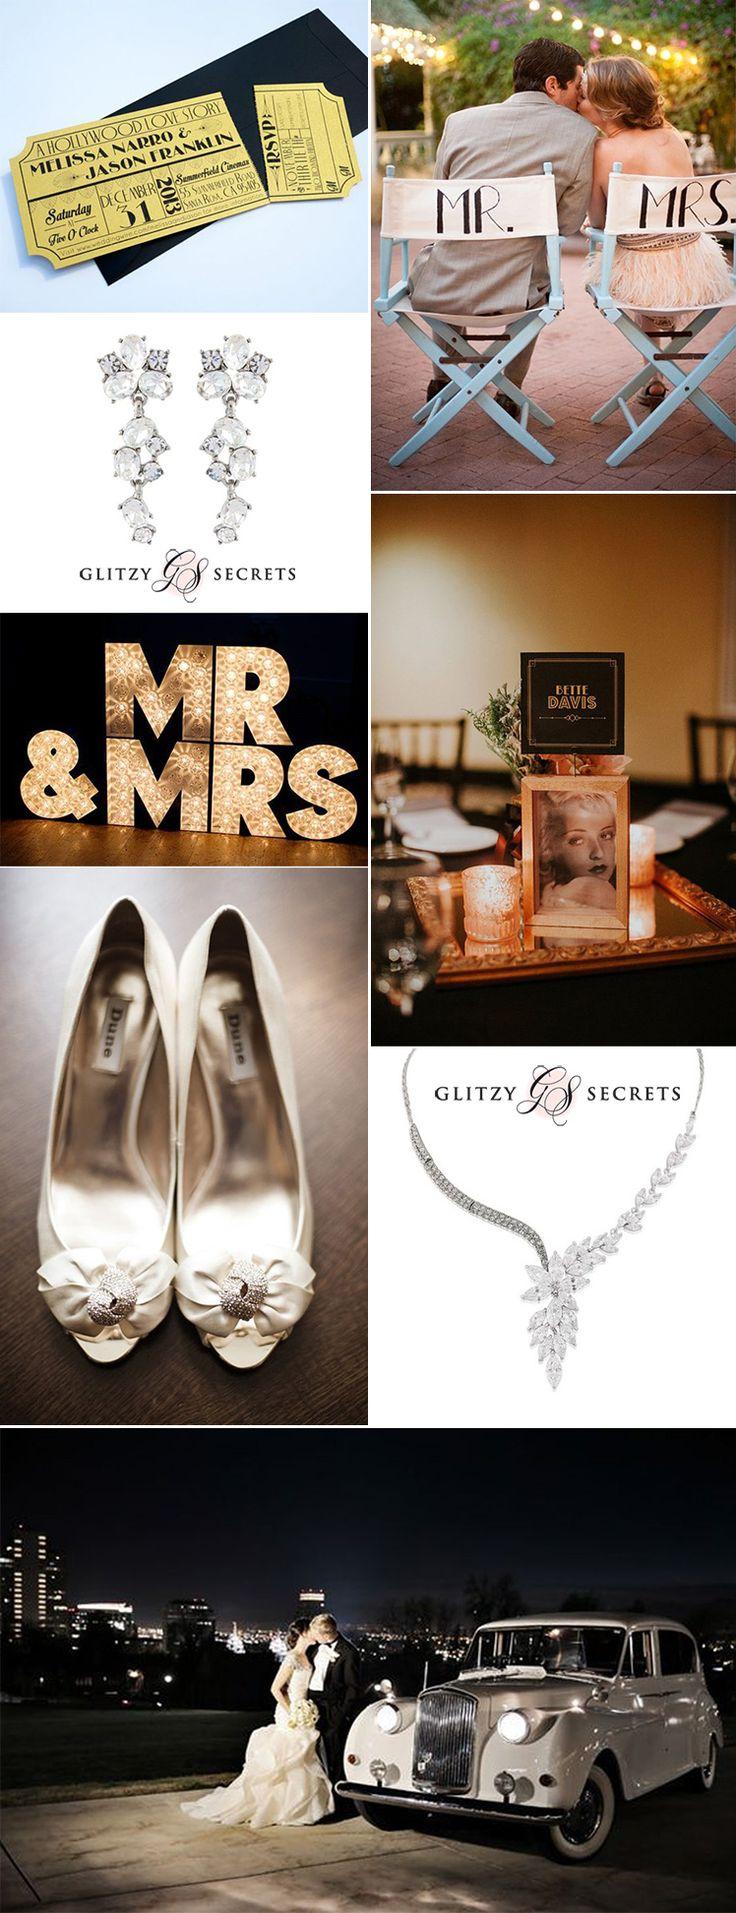 A 1940s Old Hollywood Movie Theme wedding on GS Inspiration - Glitzy Secrets